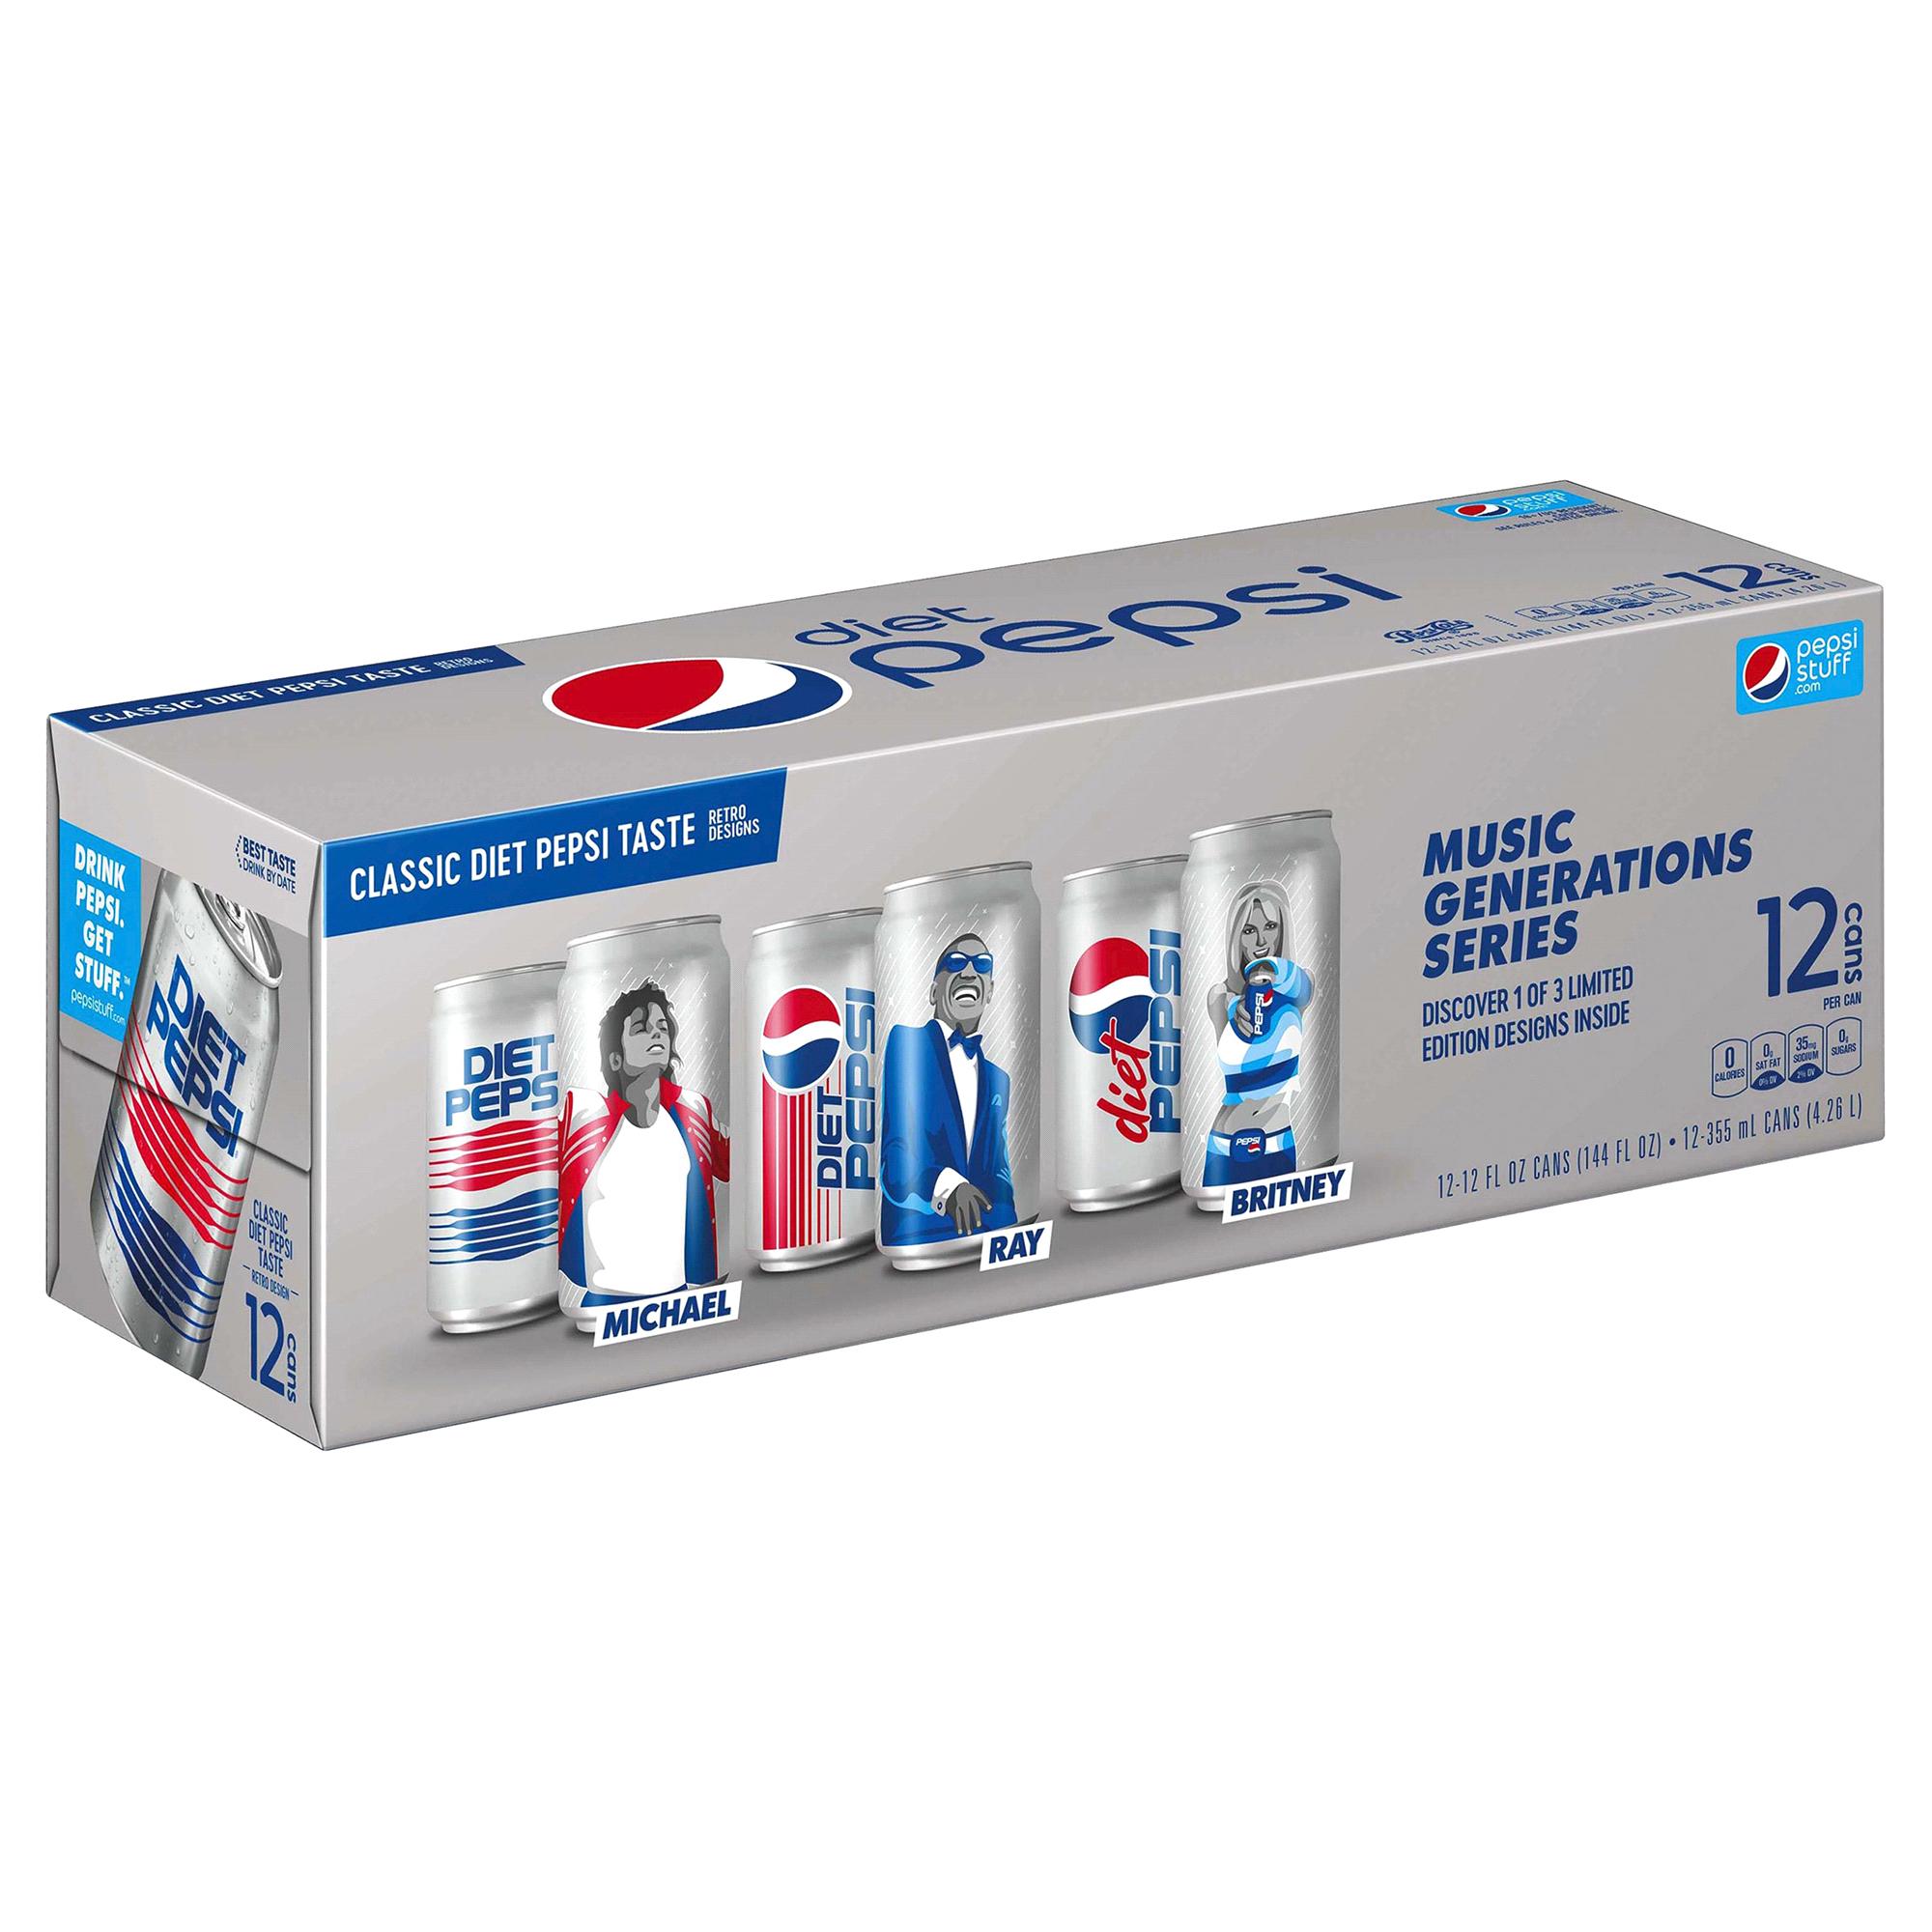 Pepsi Diet 12 oz. 12 pk. cans | Meijer.com